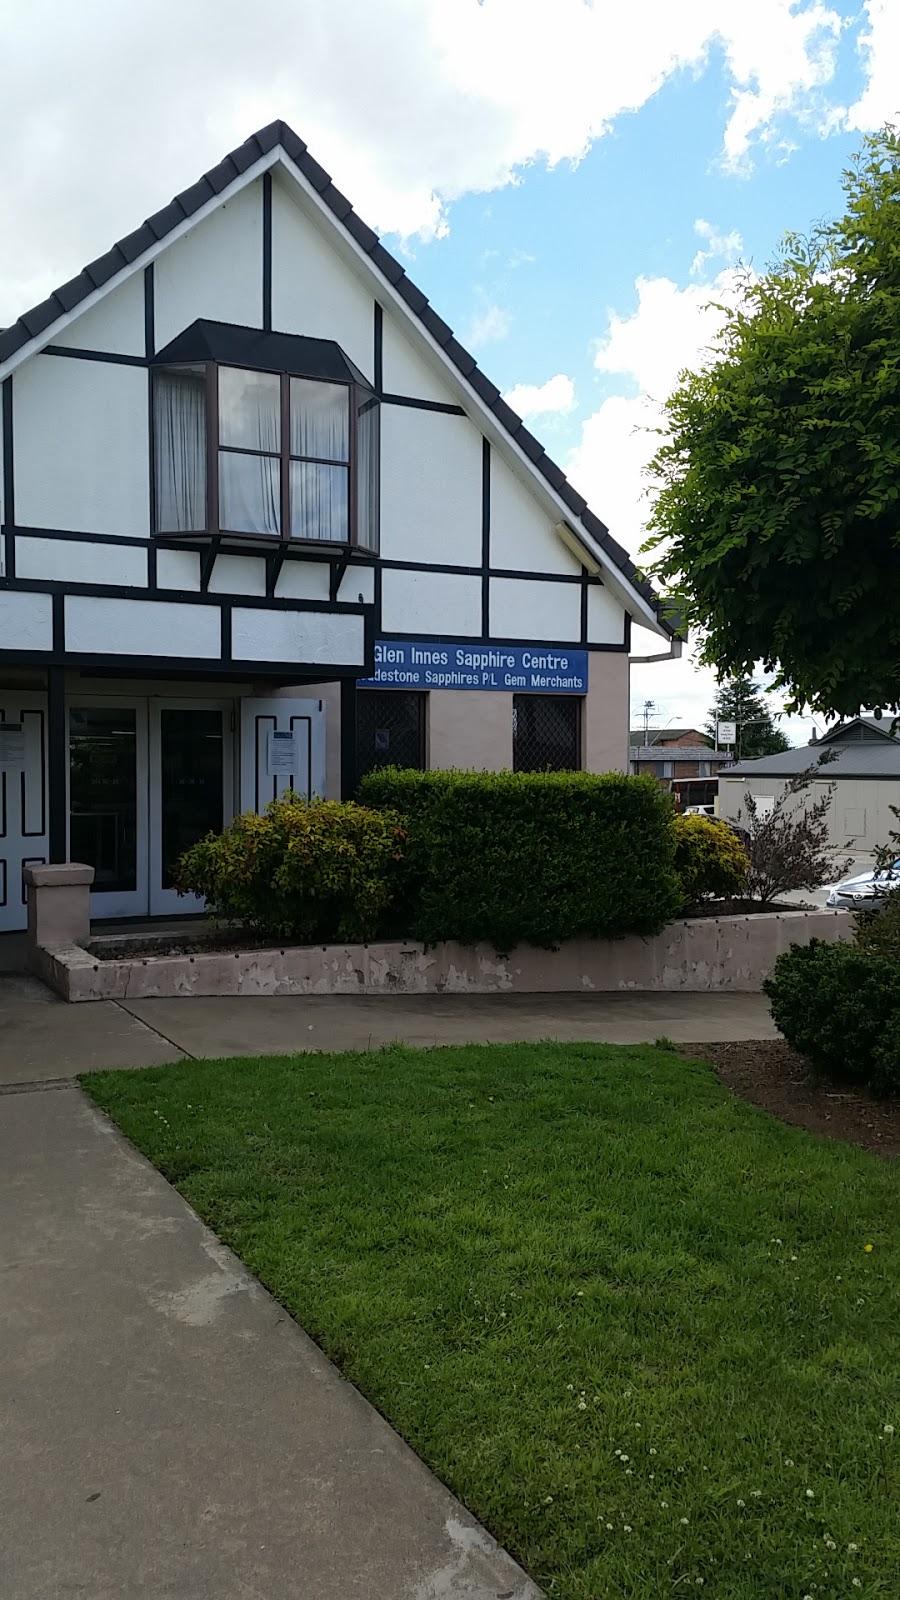 Reddestone Sapphires P/l | jewelry store | 152 Church St, Glen Innes NSW 2370, Australia | 0267325173 OR +61 2 6732 5173